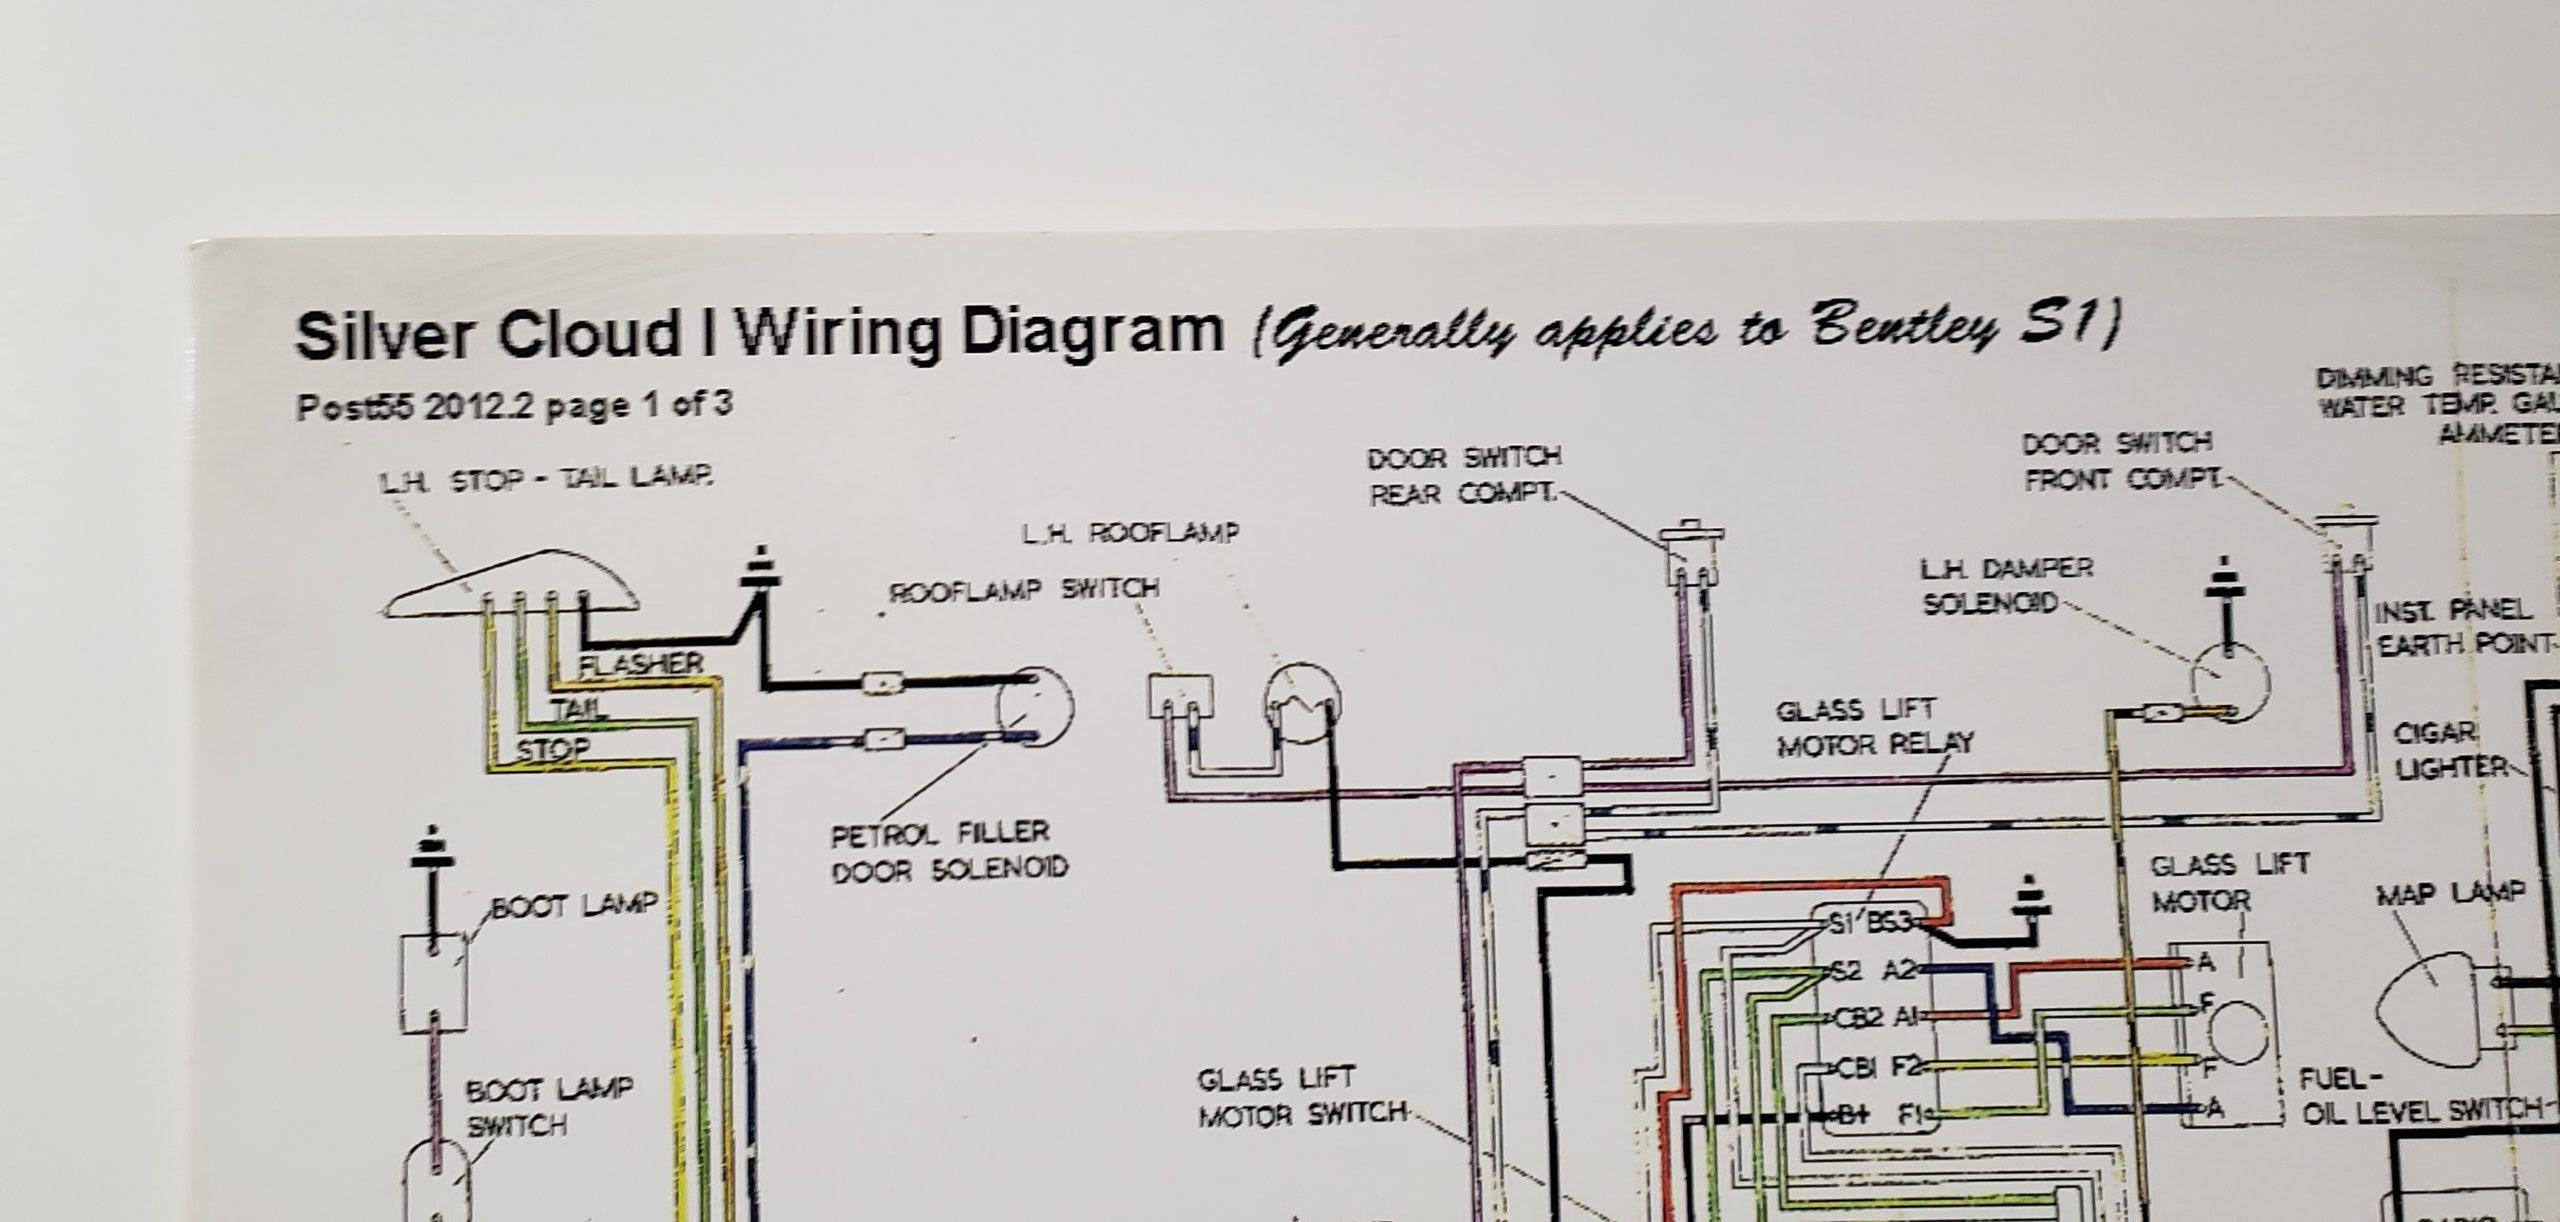 S1 Wiring Diagram Zenith Motor Company